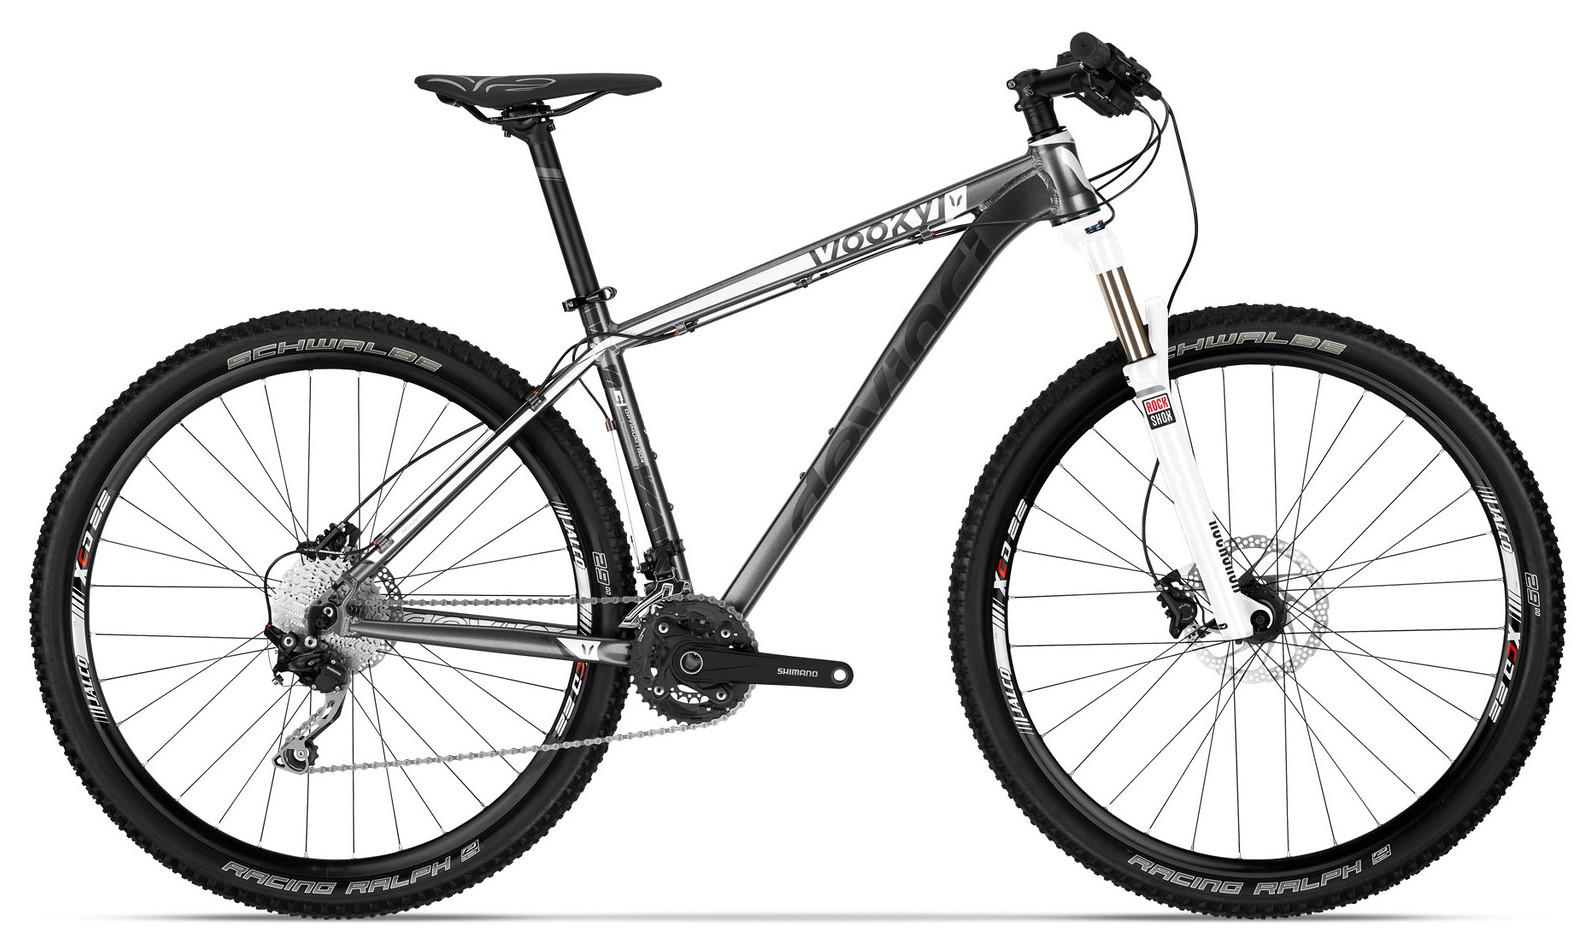 Bike - 2014 Devinci Wooky S